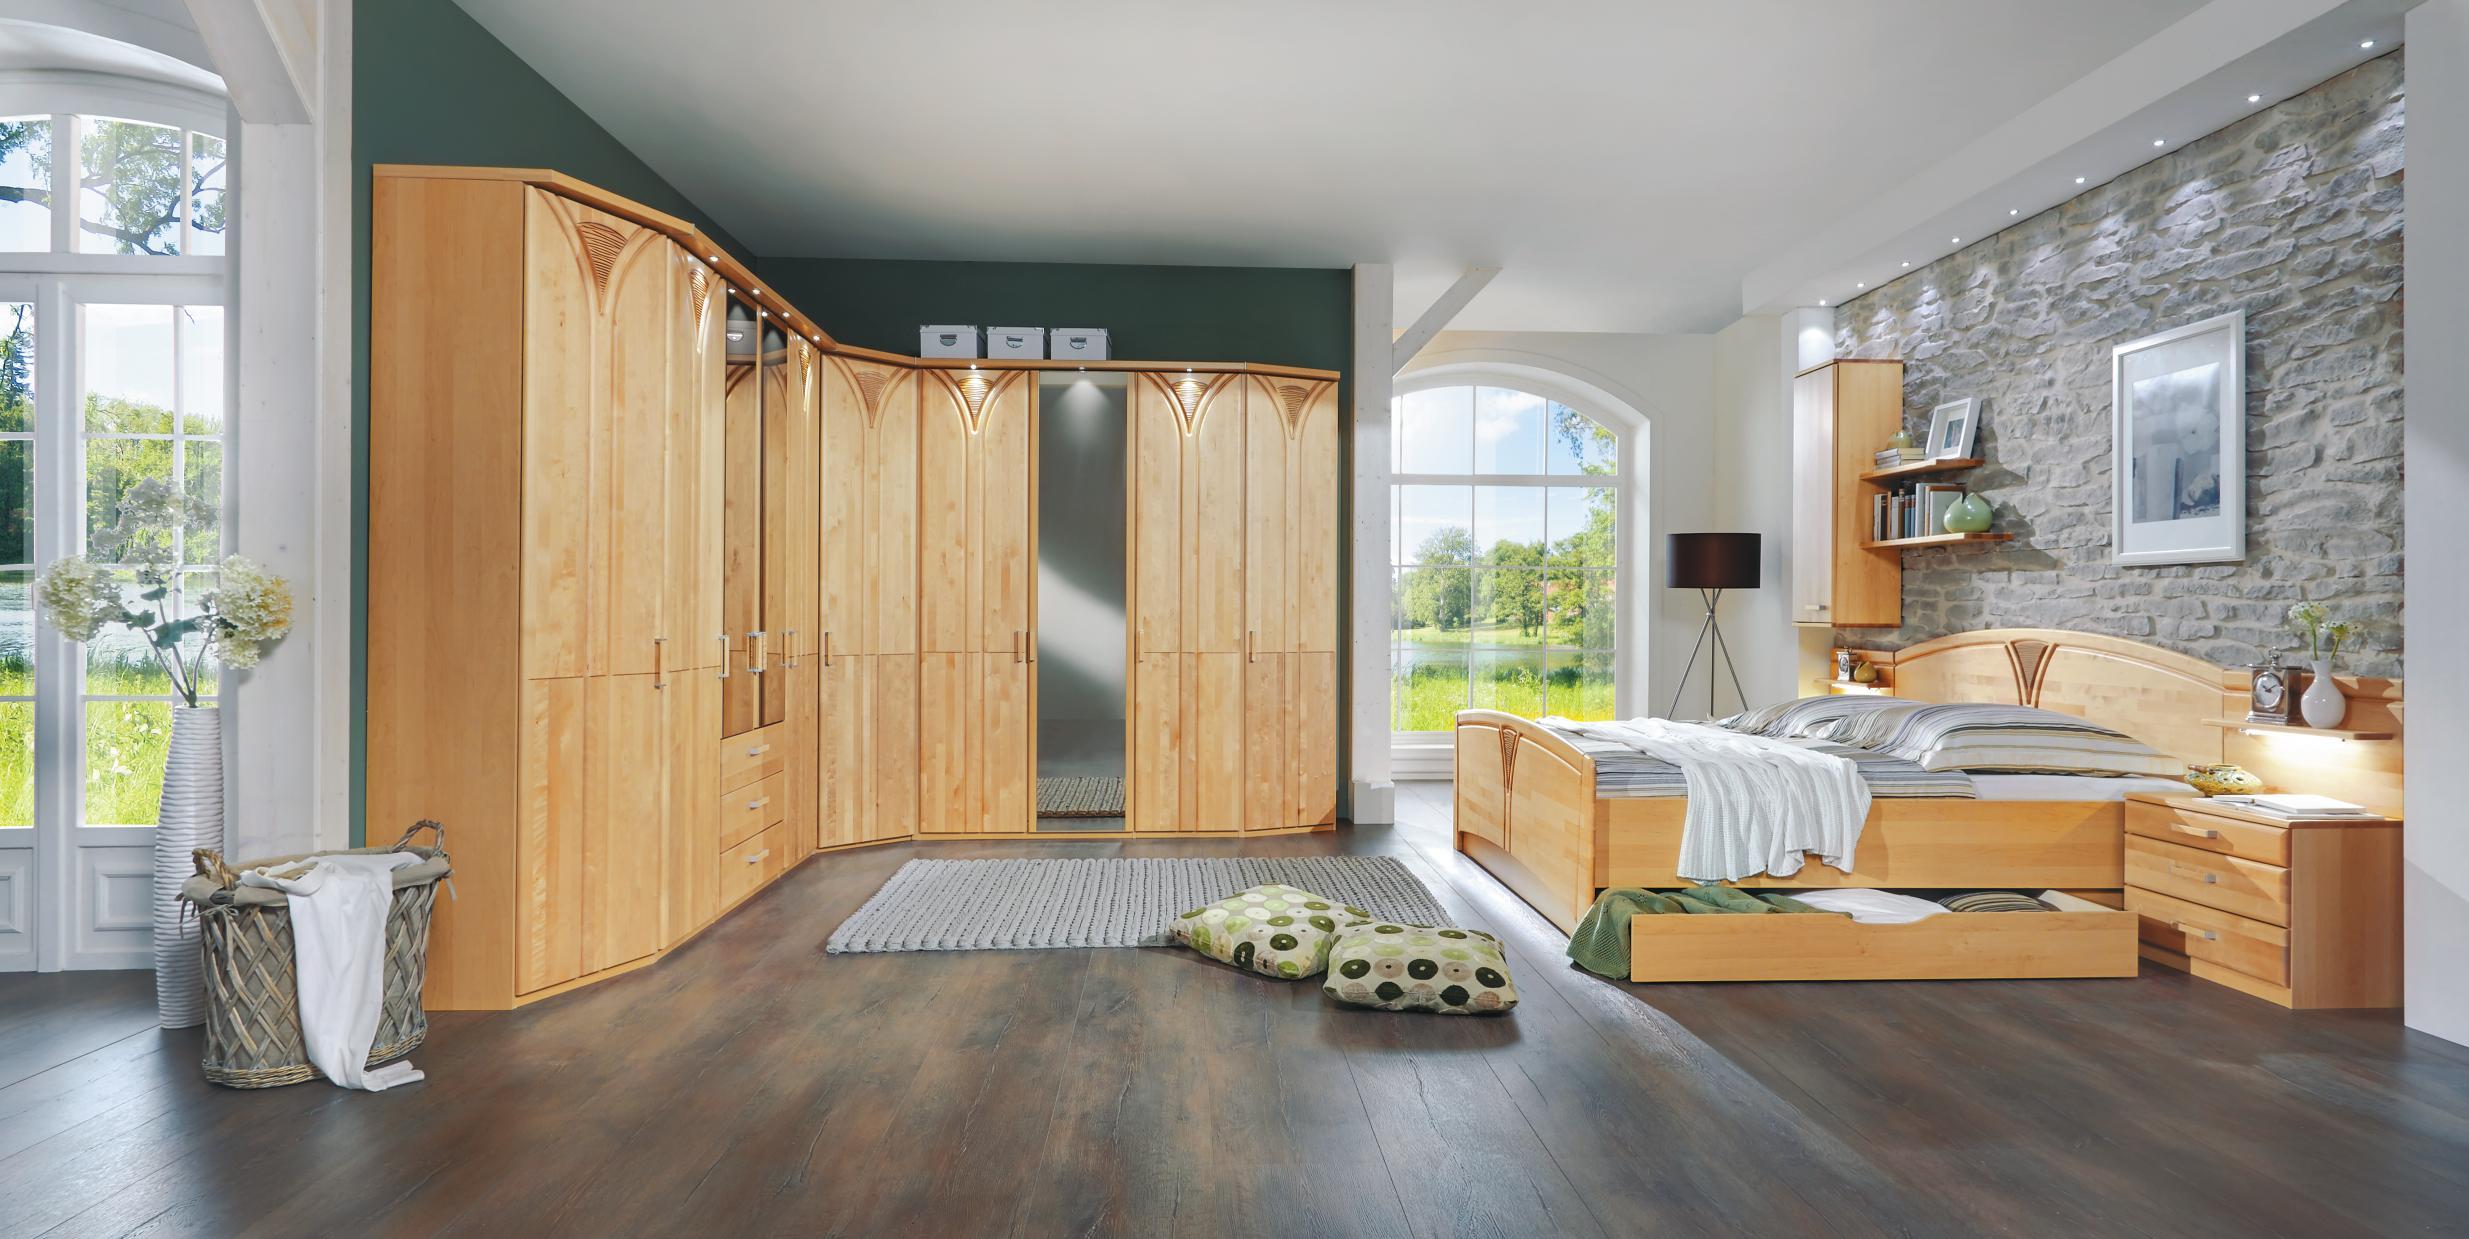 Schlafzimmer Mann Mobilia ~ Ihausdesign.co